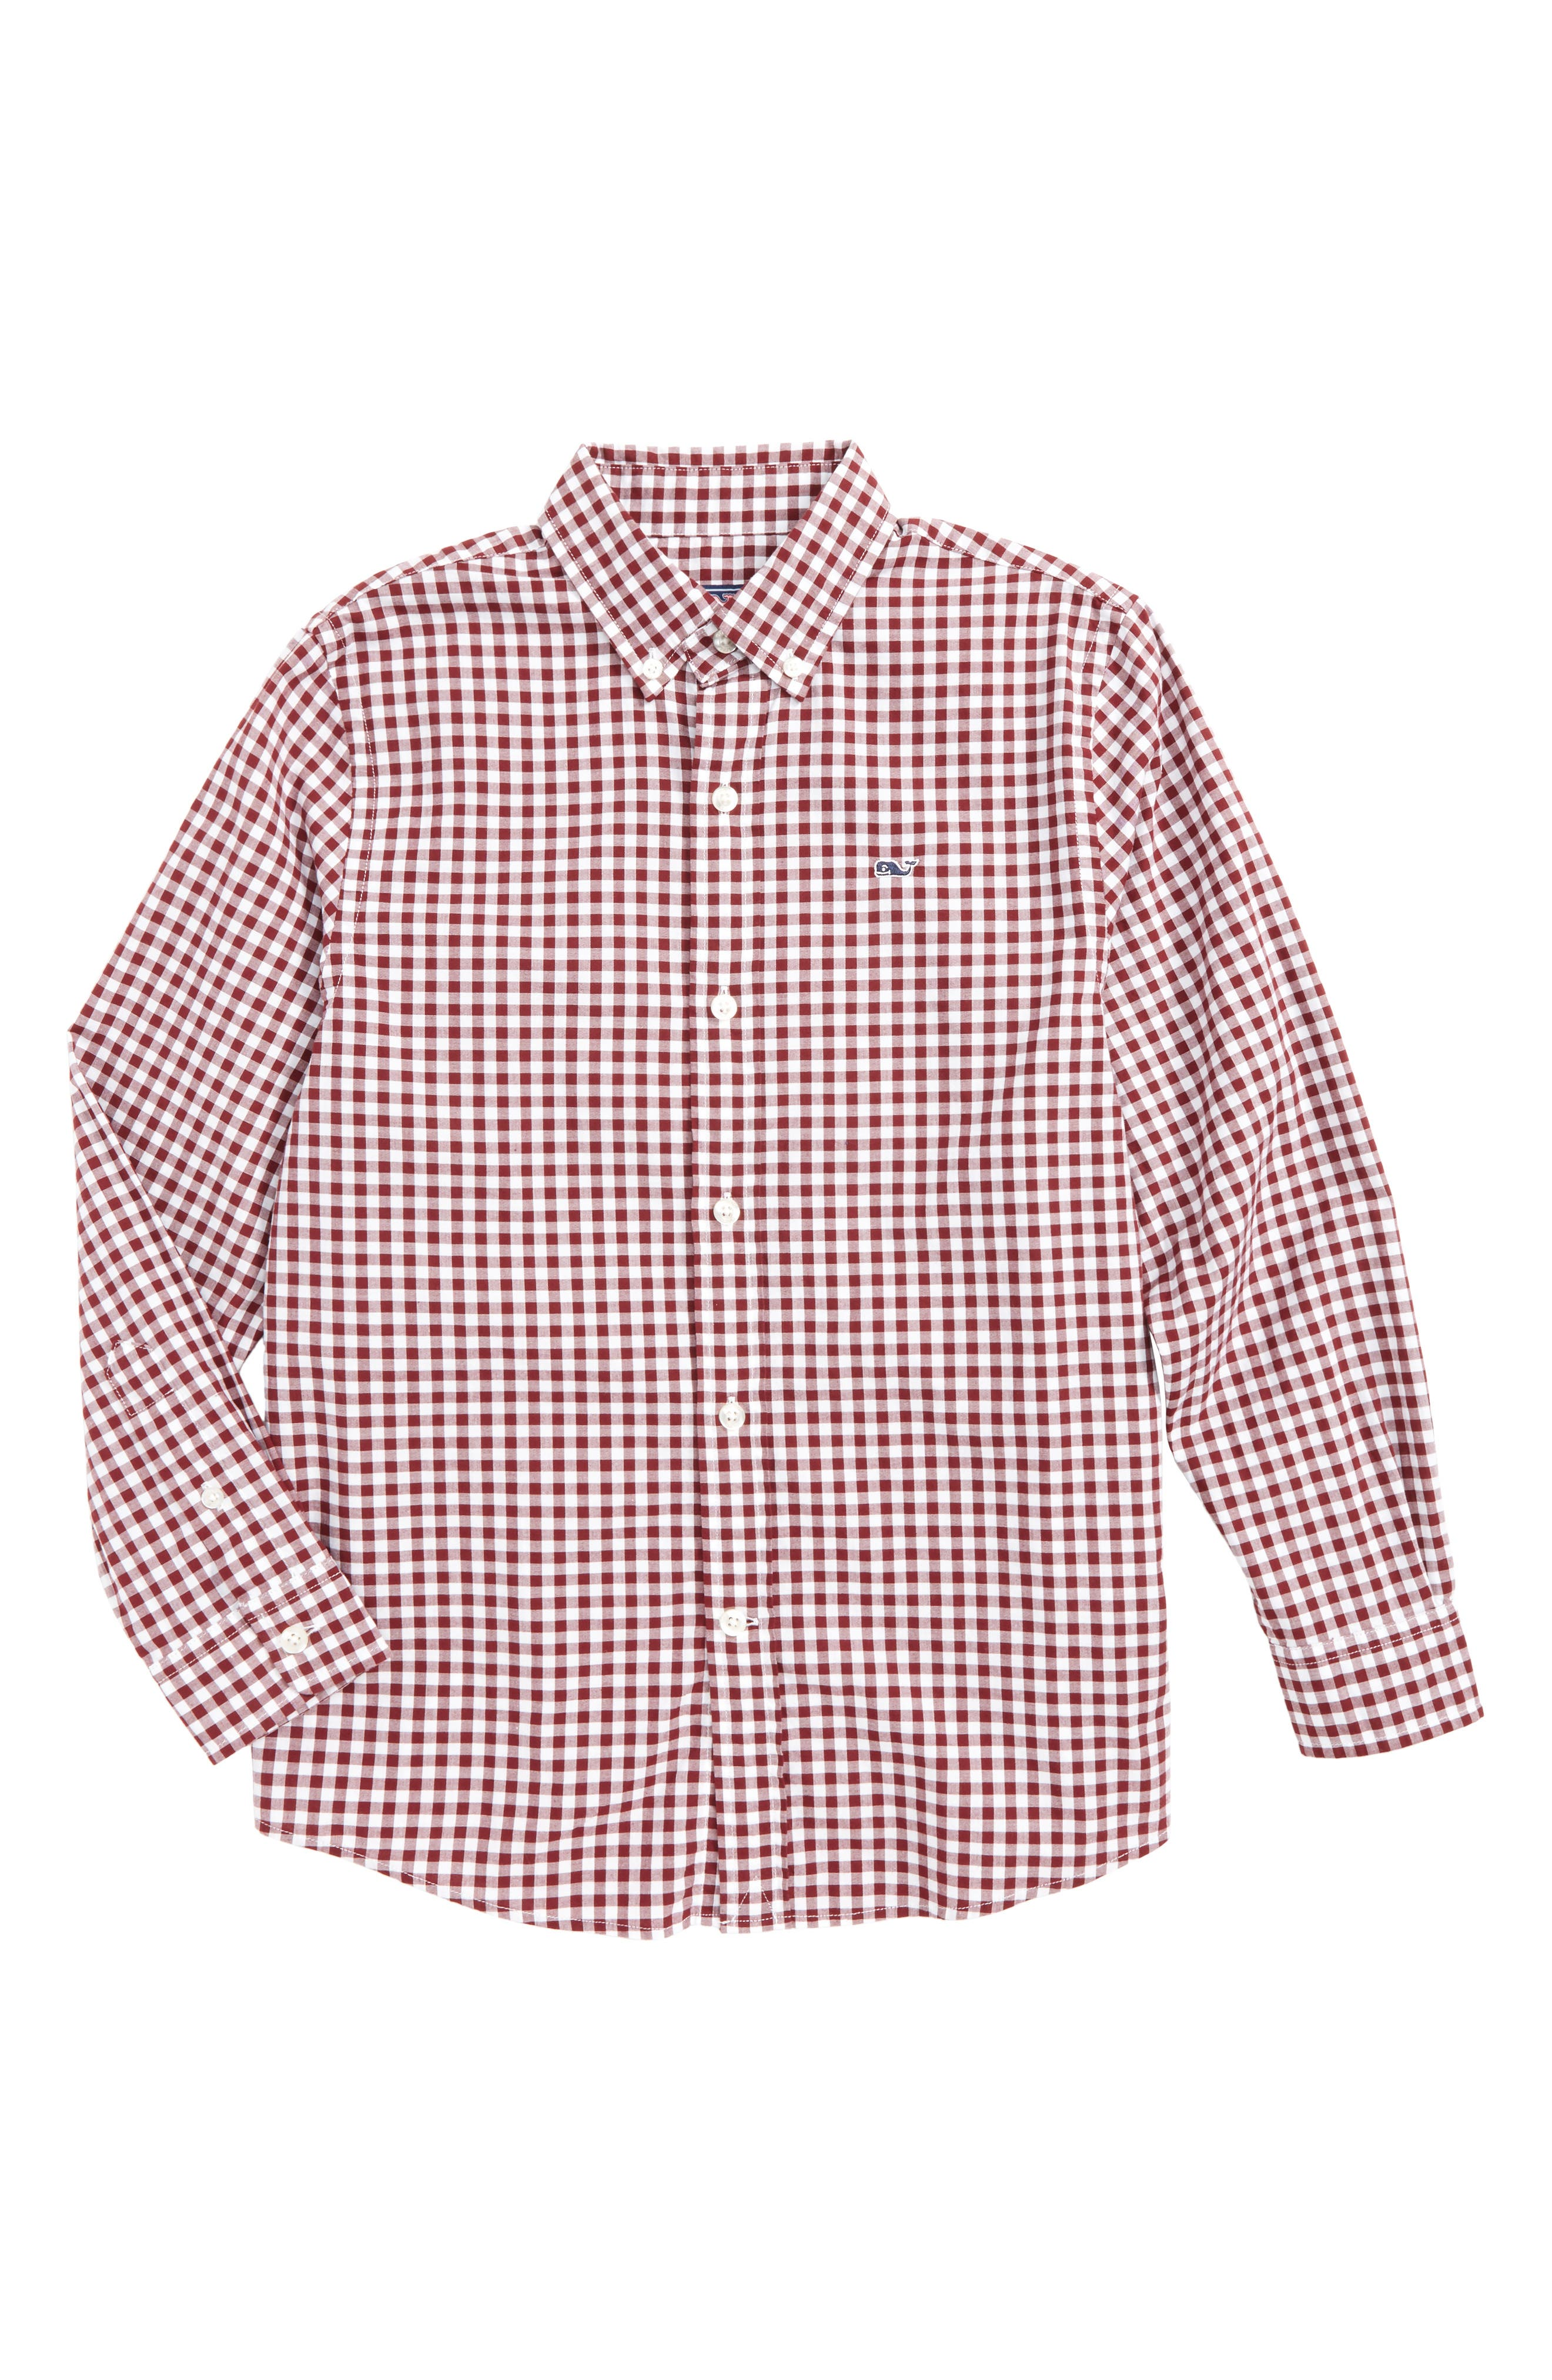 Garden Quarter Gingham Whale Shirt,                             Main thumbnail 1, color,                             603